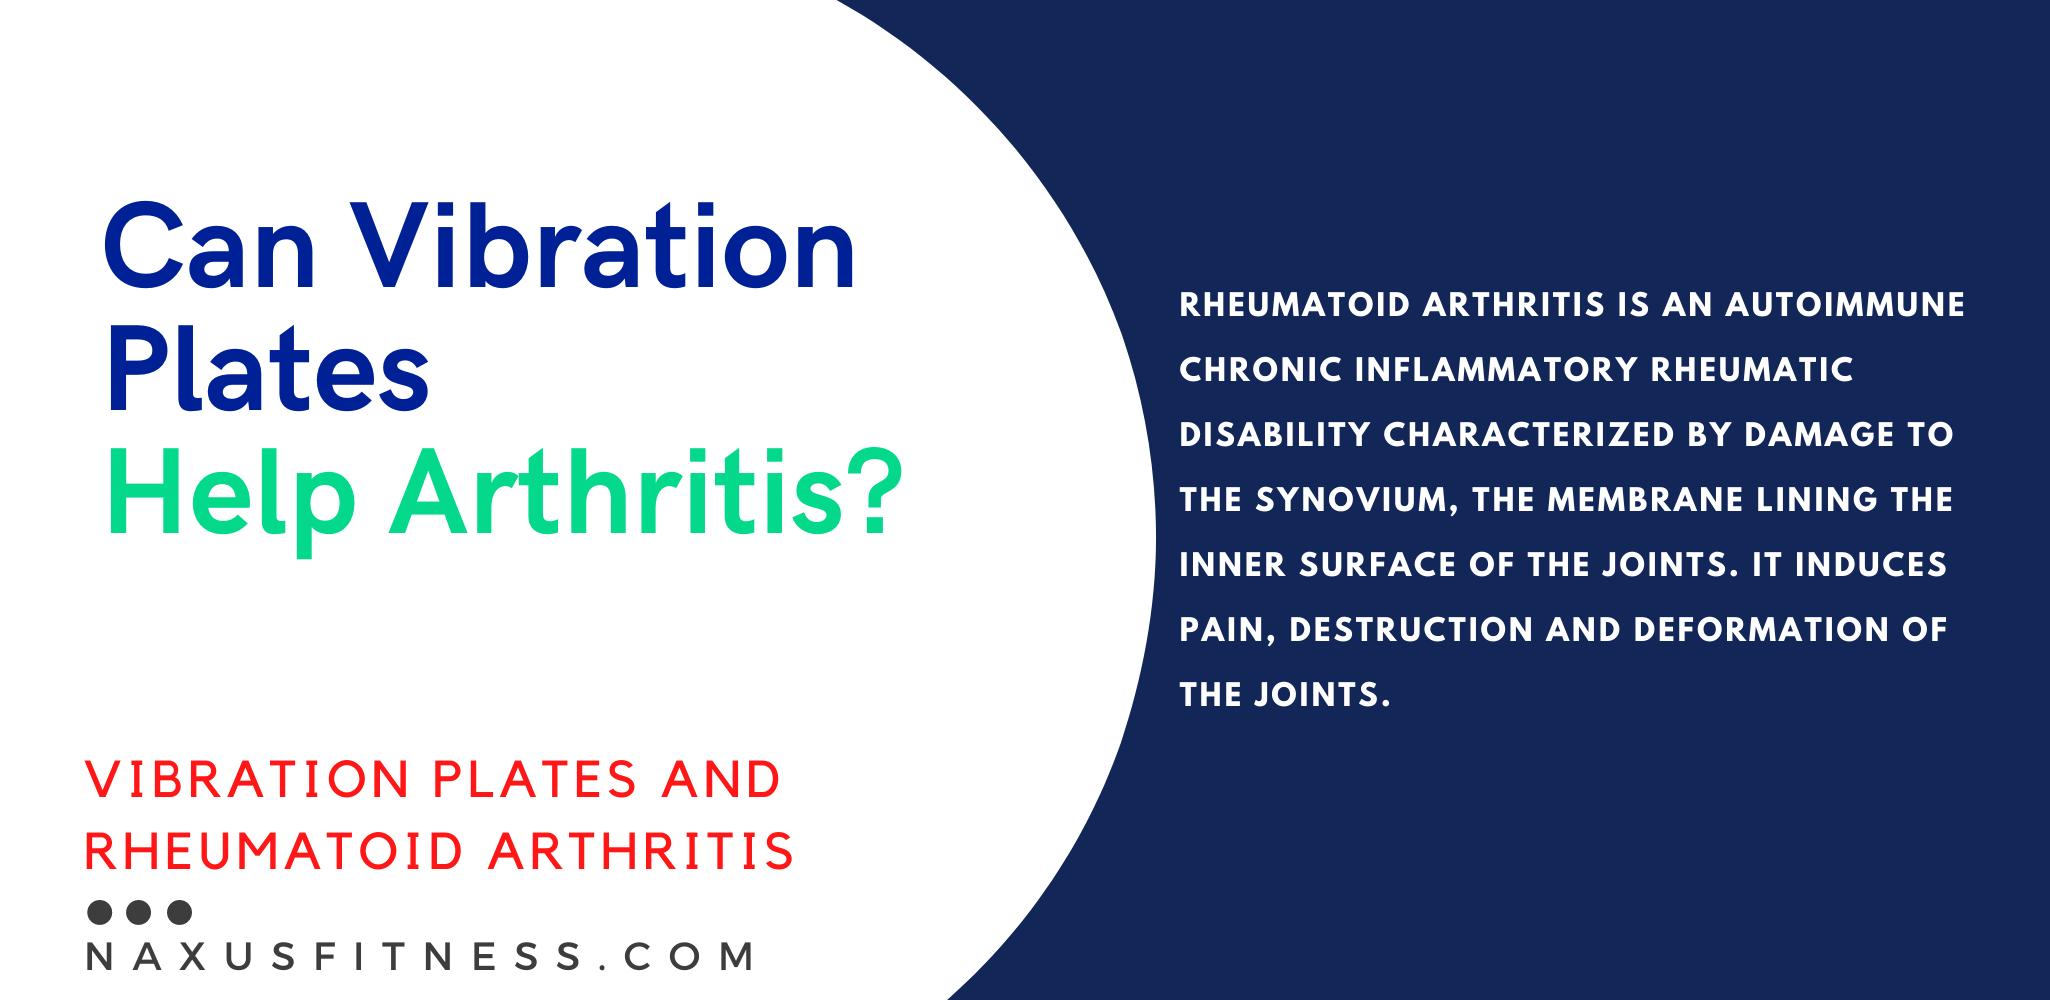 Can Vibration Plates Help Arthritis - Rheumatoid arthritis